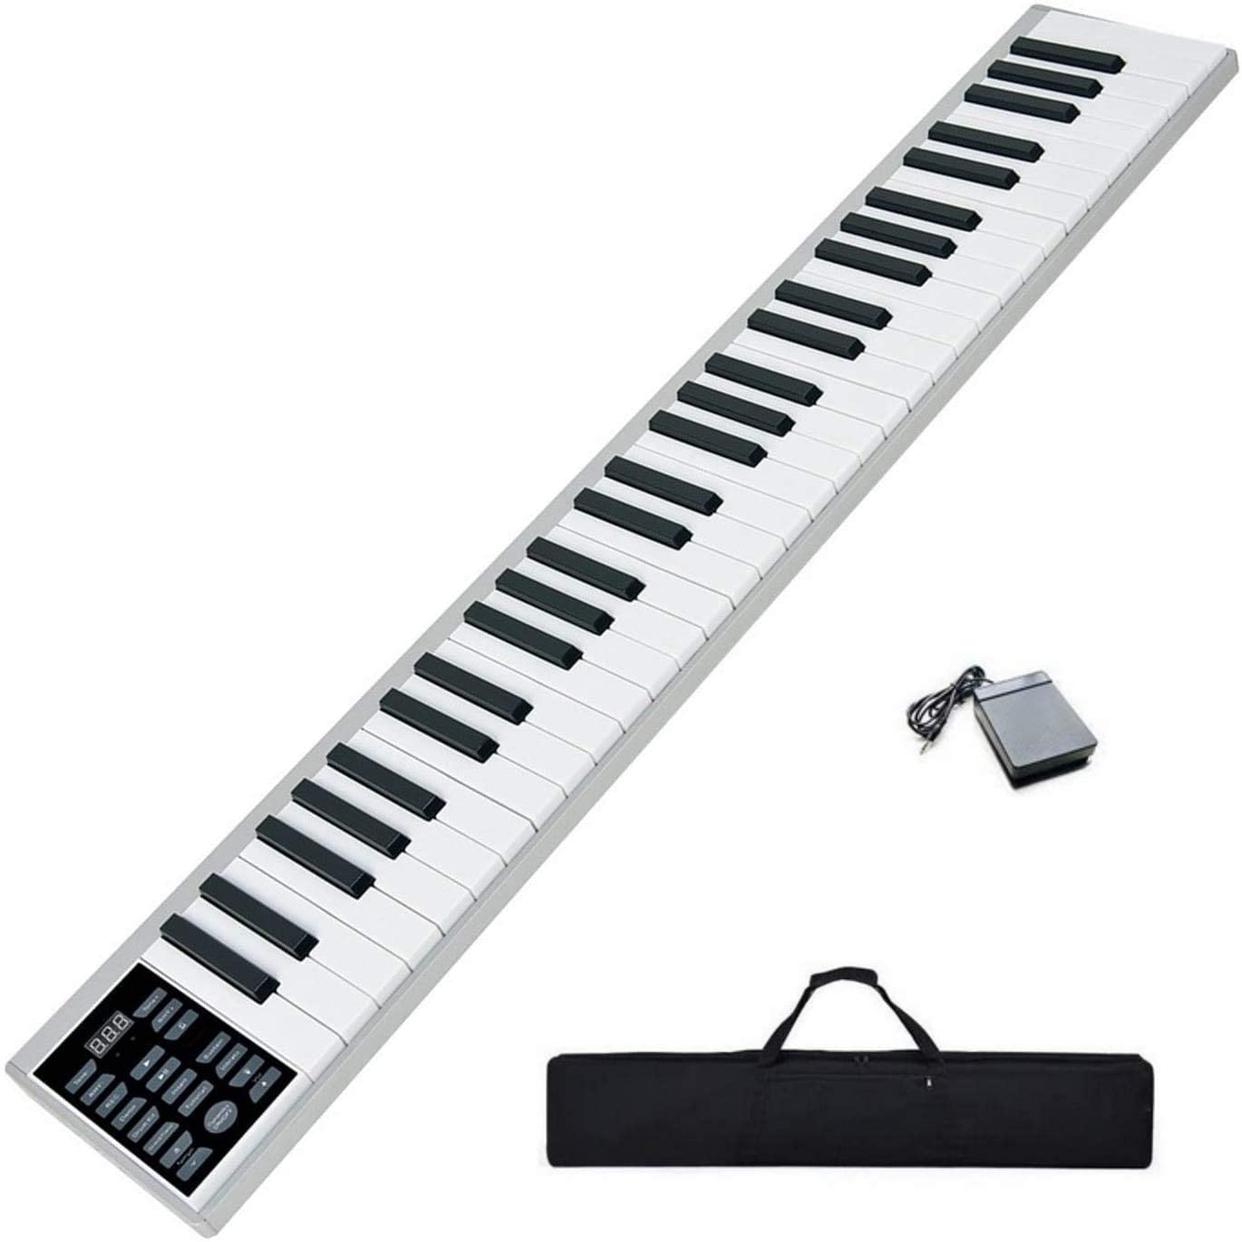 NikoMaku(ニコマク) 電子ピアノの商品画像